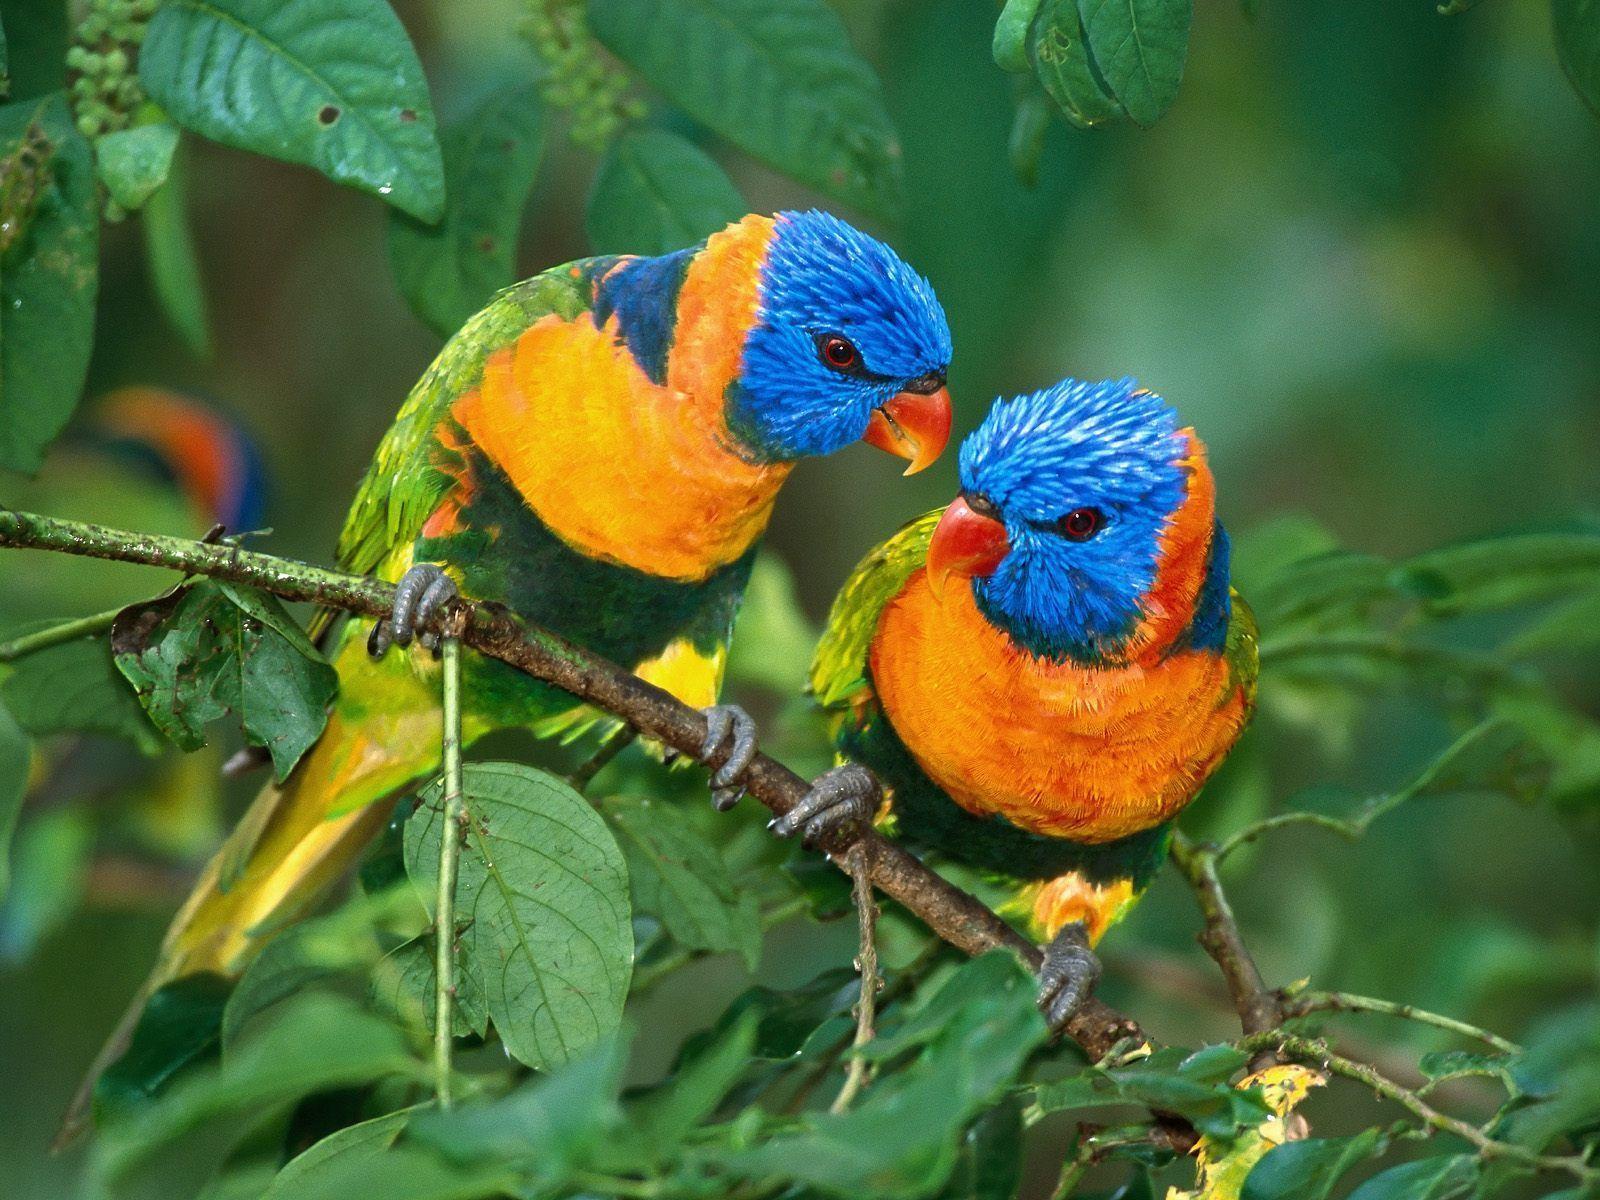 Birds hd wallpapers, bird wallpapers